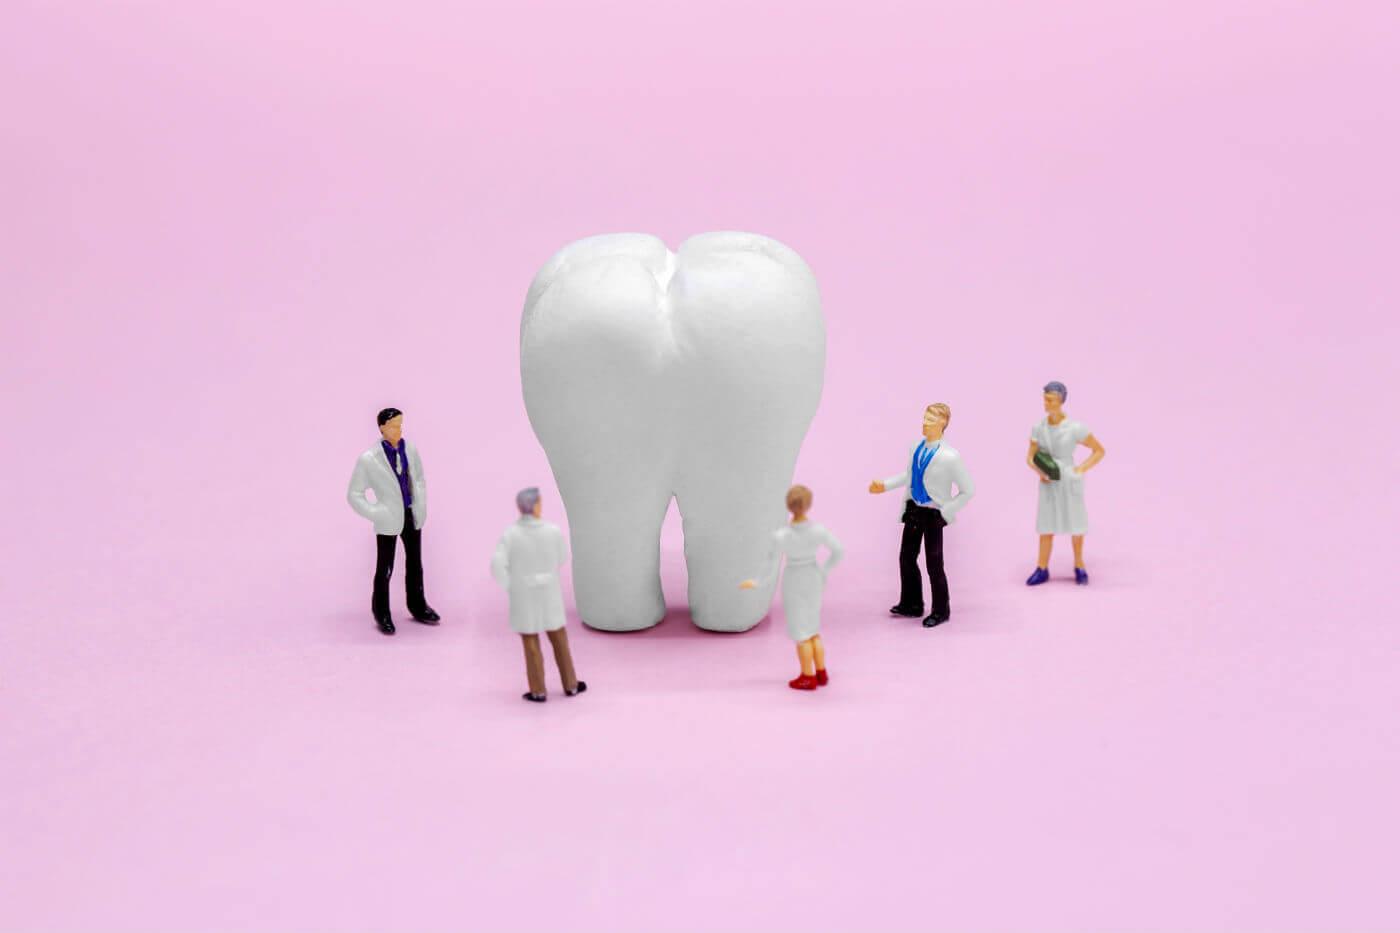 Diente miniaturizado tooth on a cheap